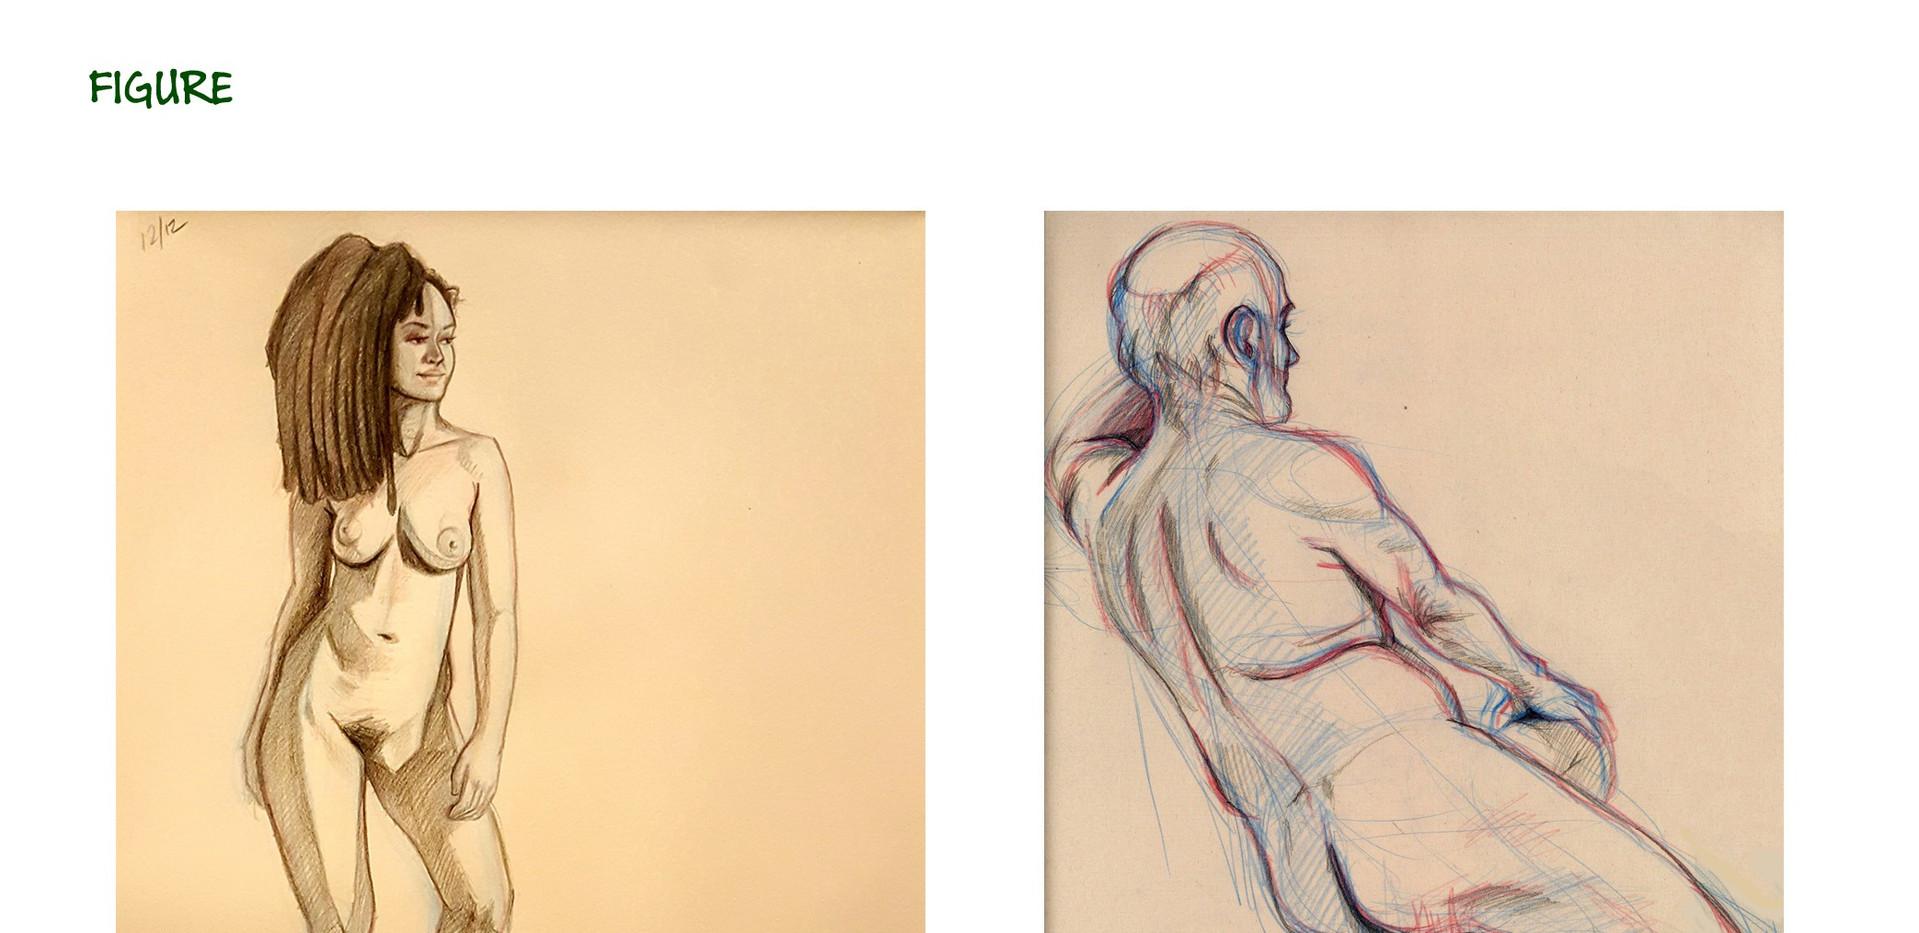 sketchslides_figure1_edited.jpg